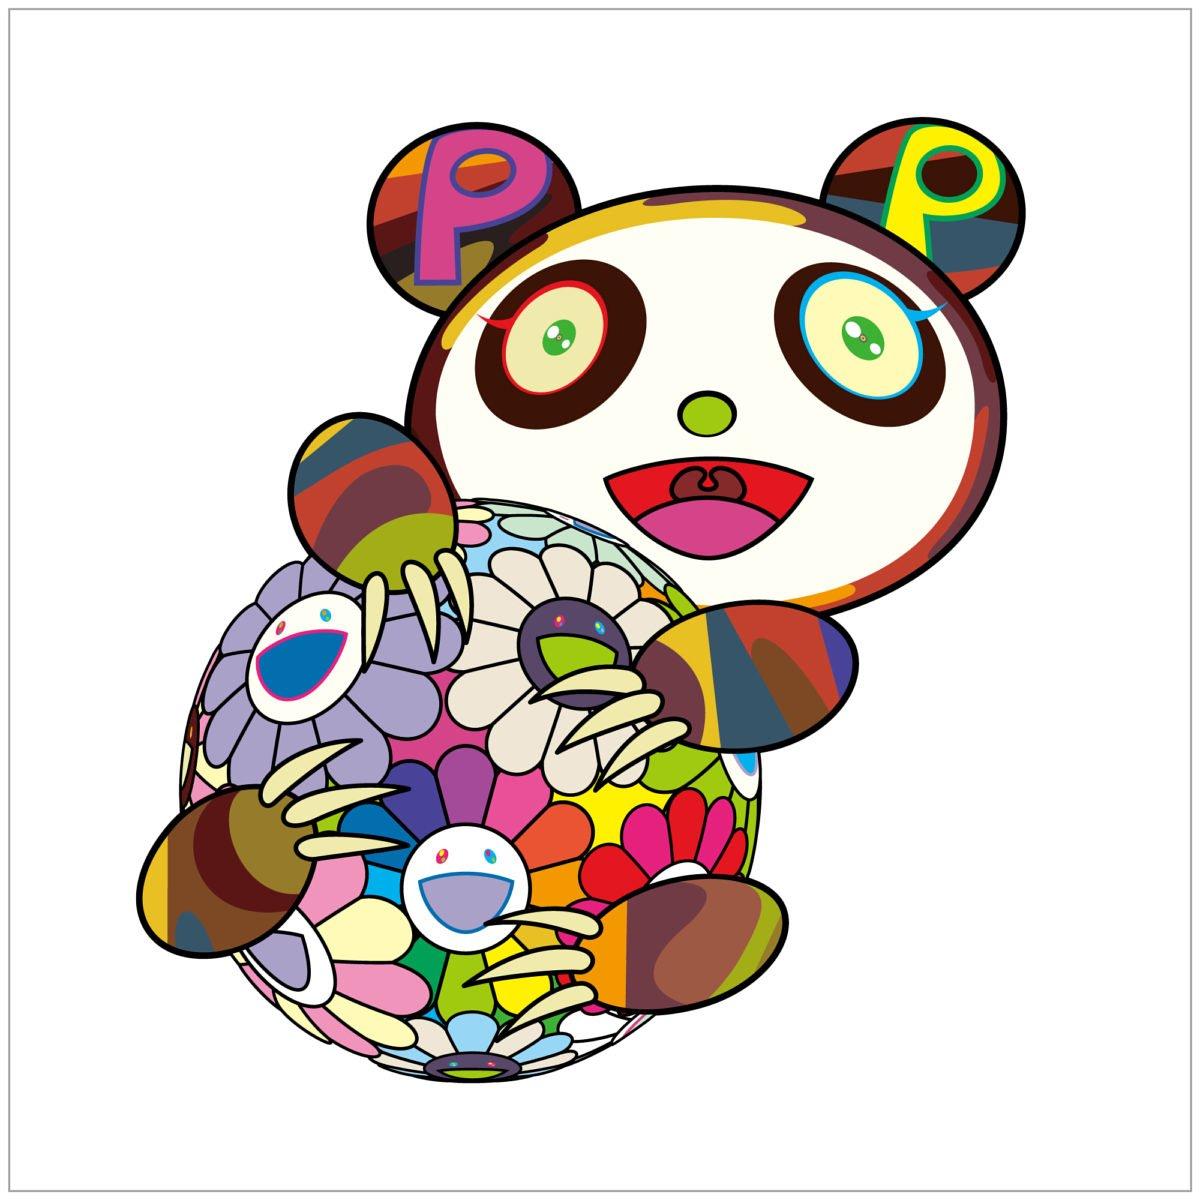 村上隆 Takashi Murakami A child's panda hugging a flower ball 抱花球的熊貓 版畫